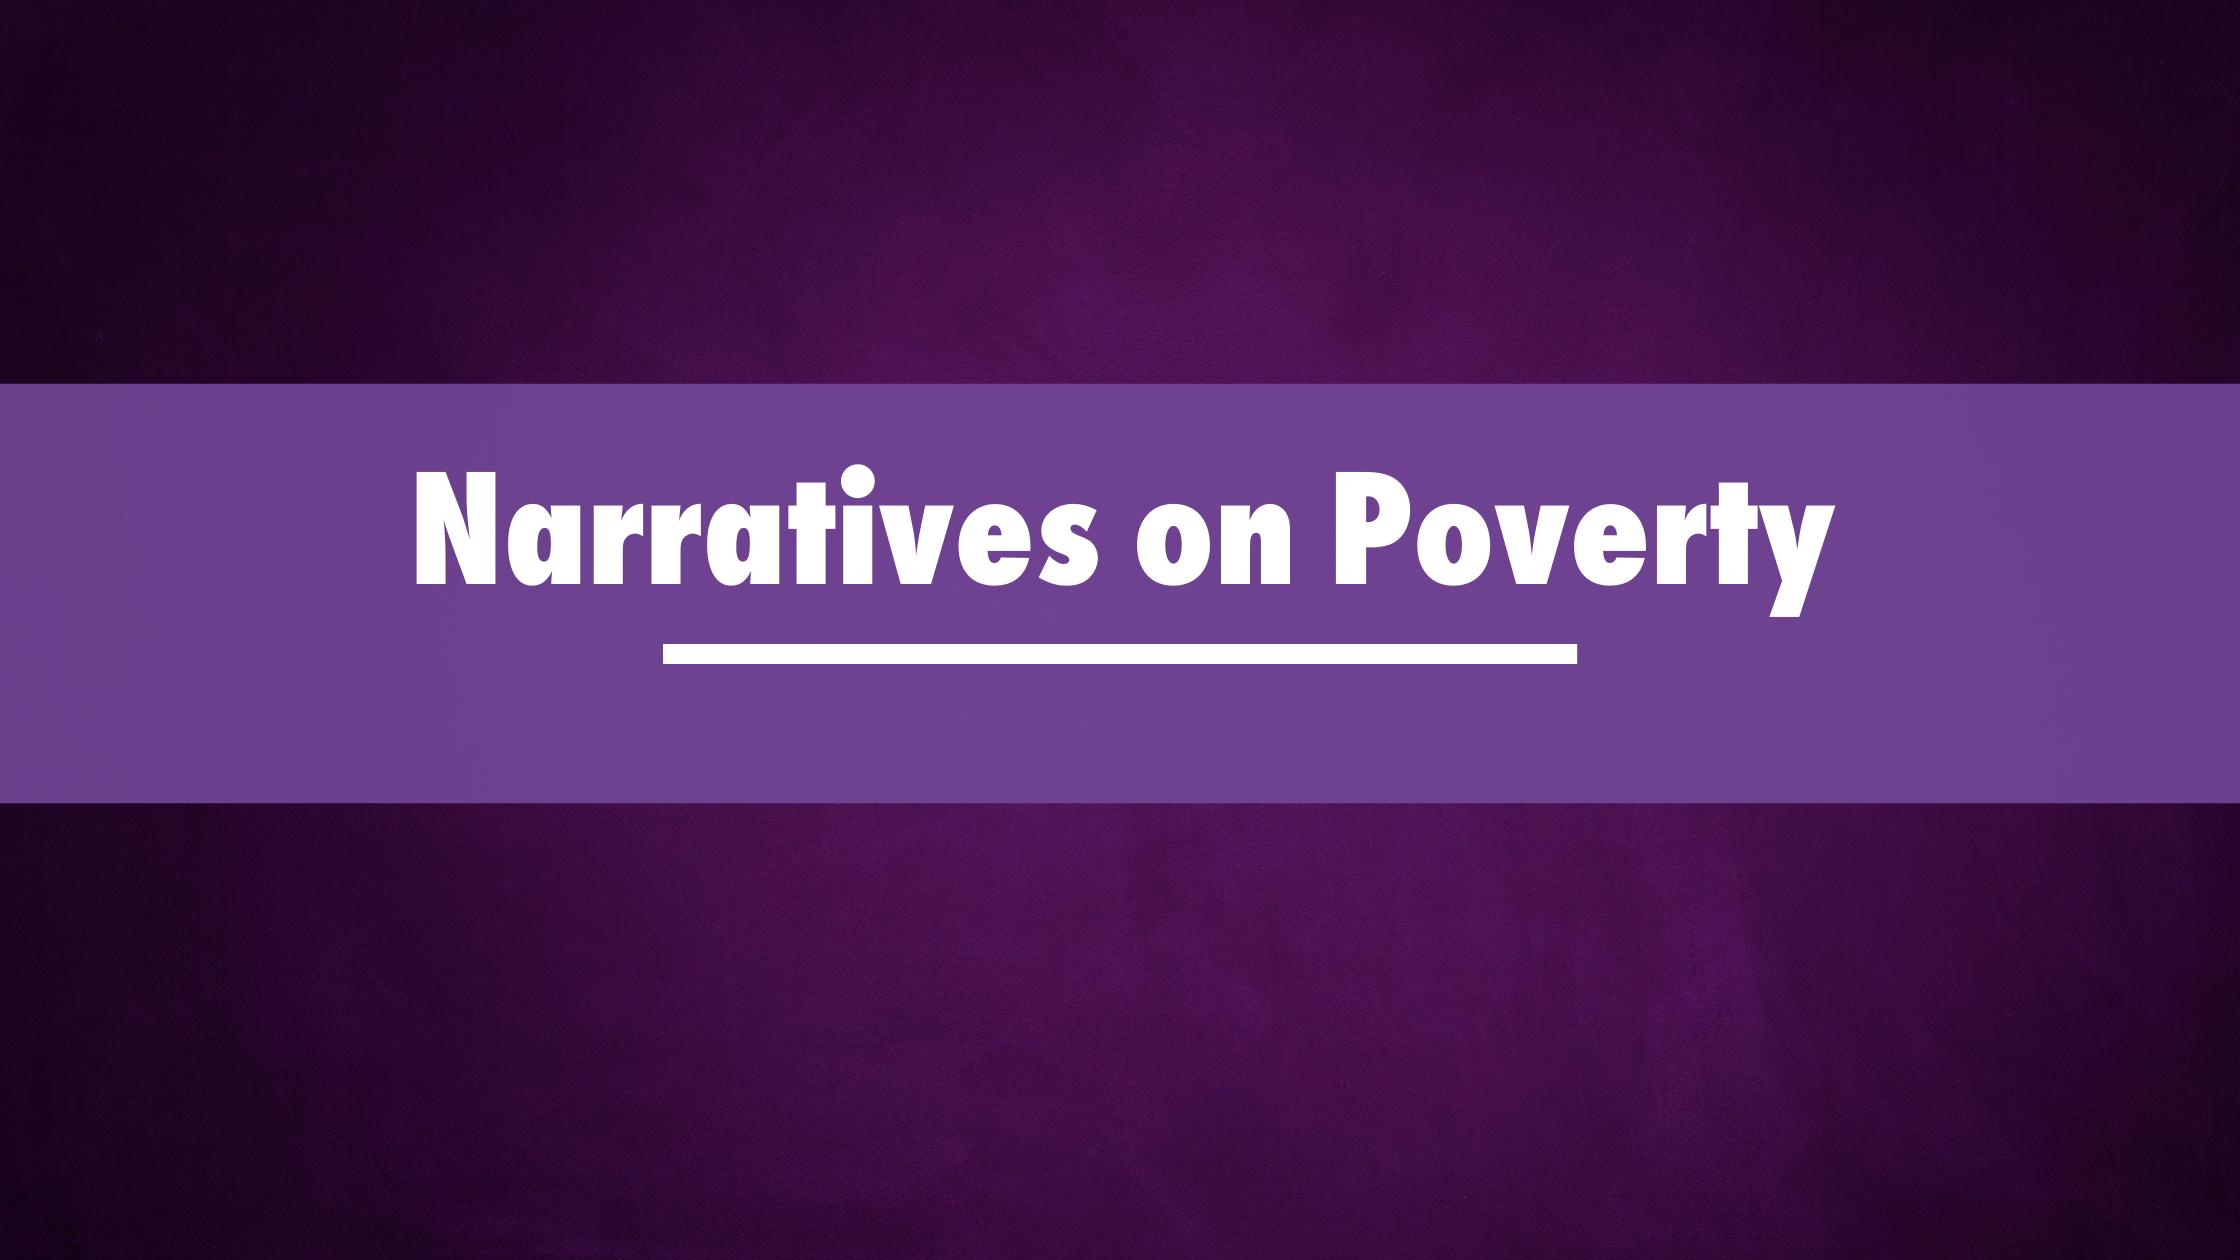 Narratives on Poverty